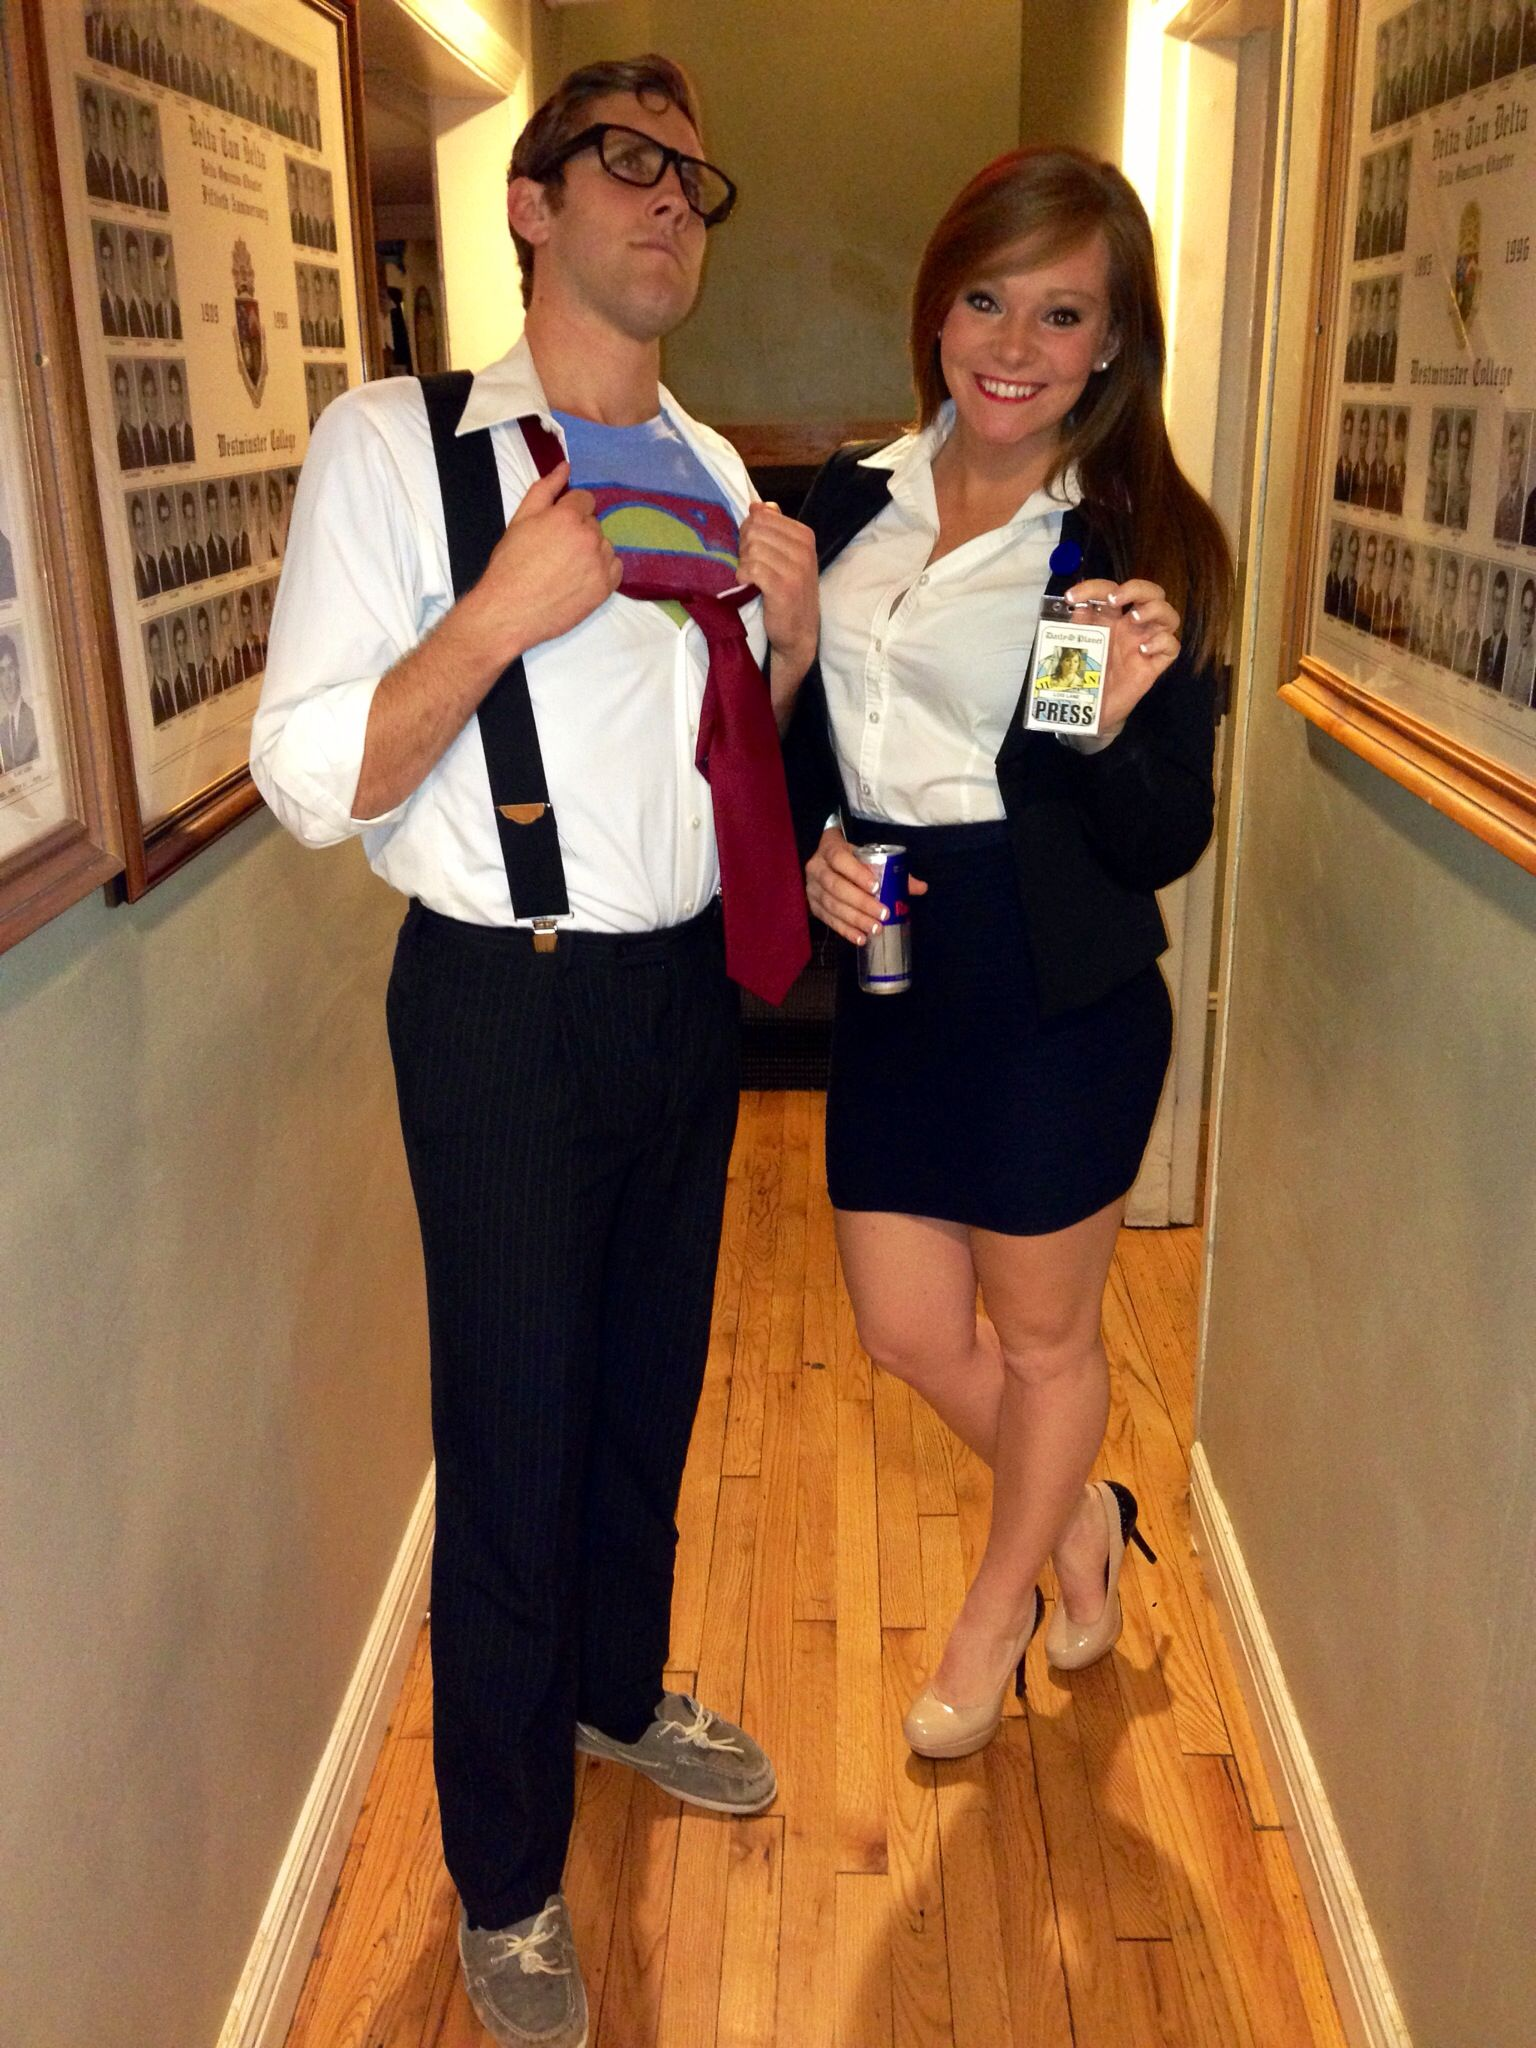 Superman and Lois Lane couples halloween costume #couples #halloween # costume  sc 1 st  Pinterest & Superman and Lois Lane couples halloween costume #couples #halloween ...